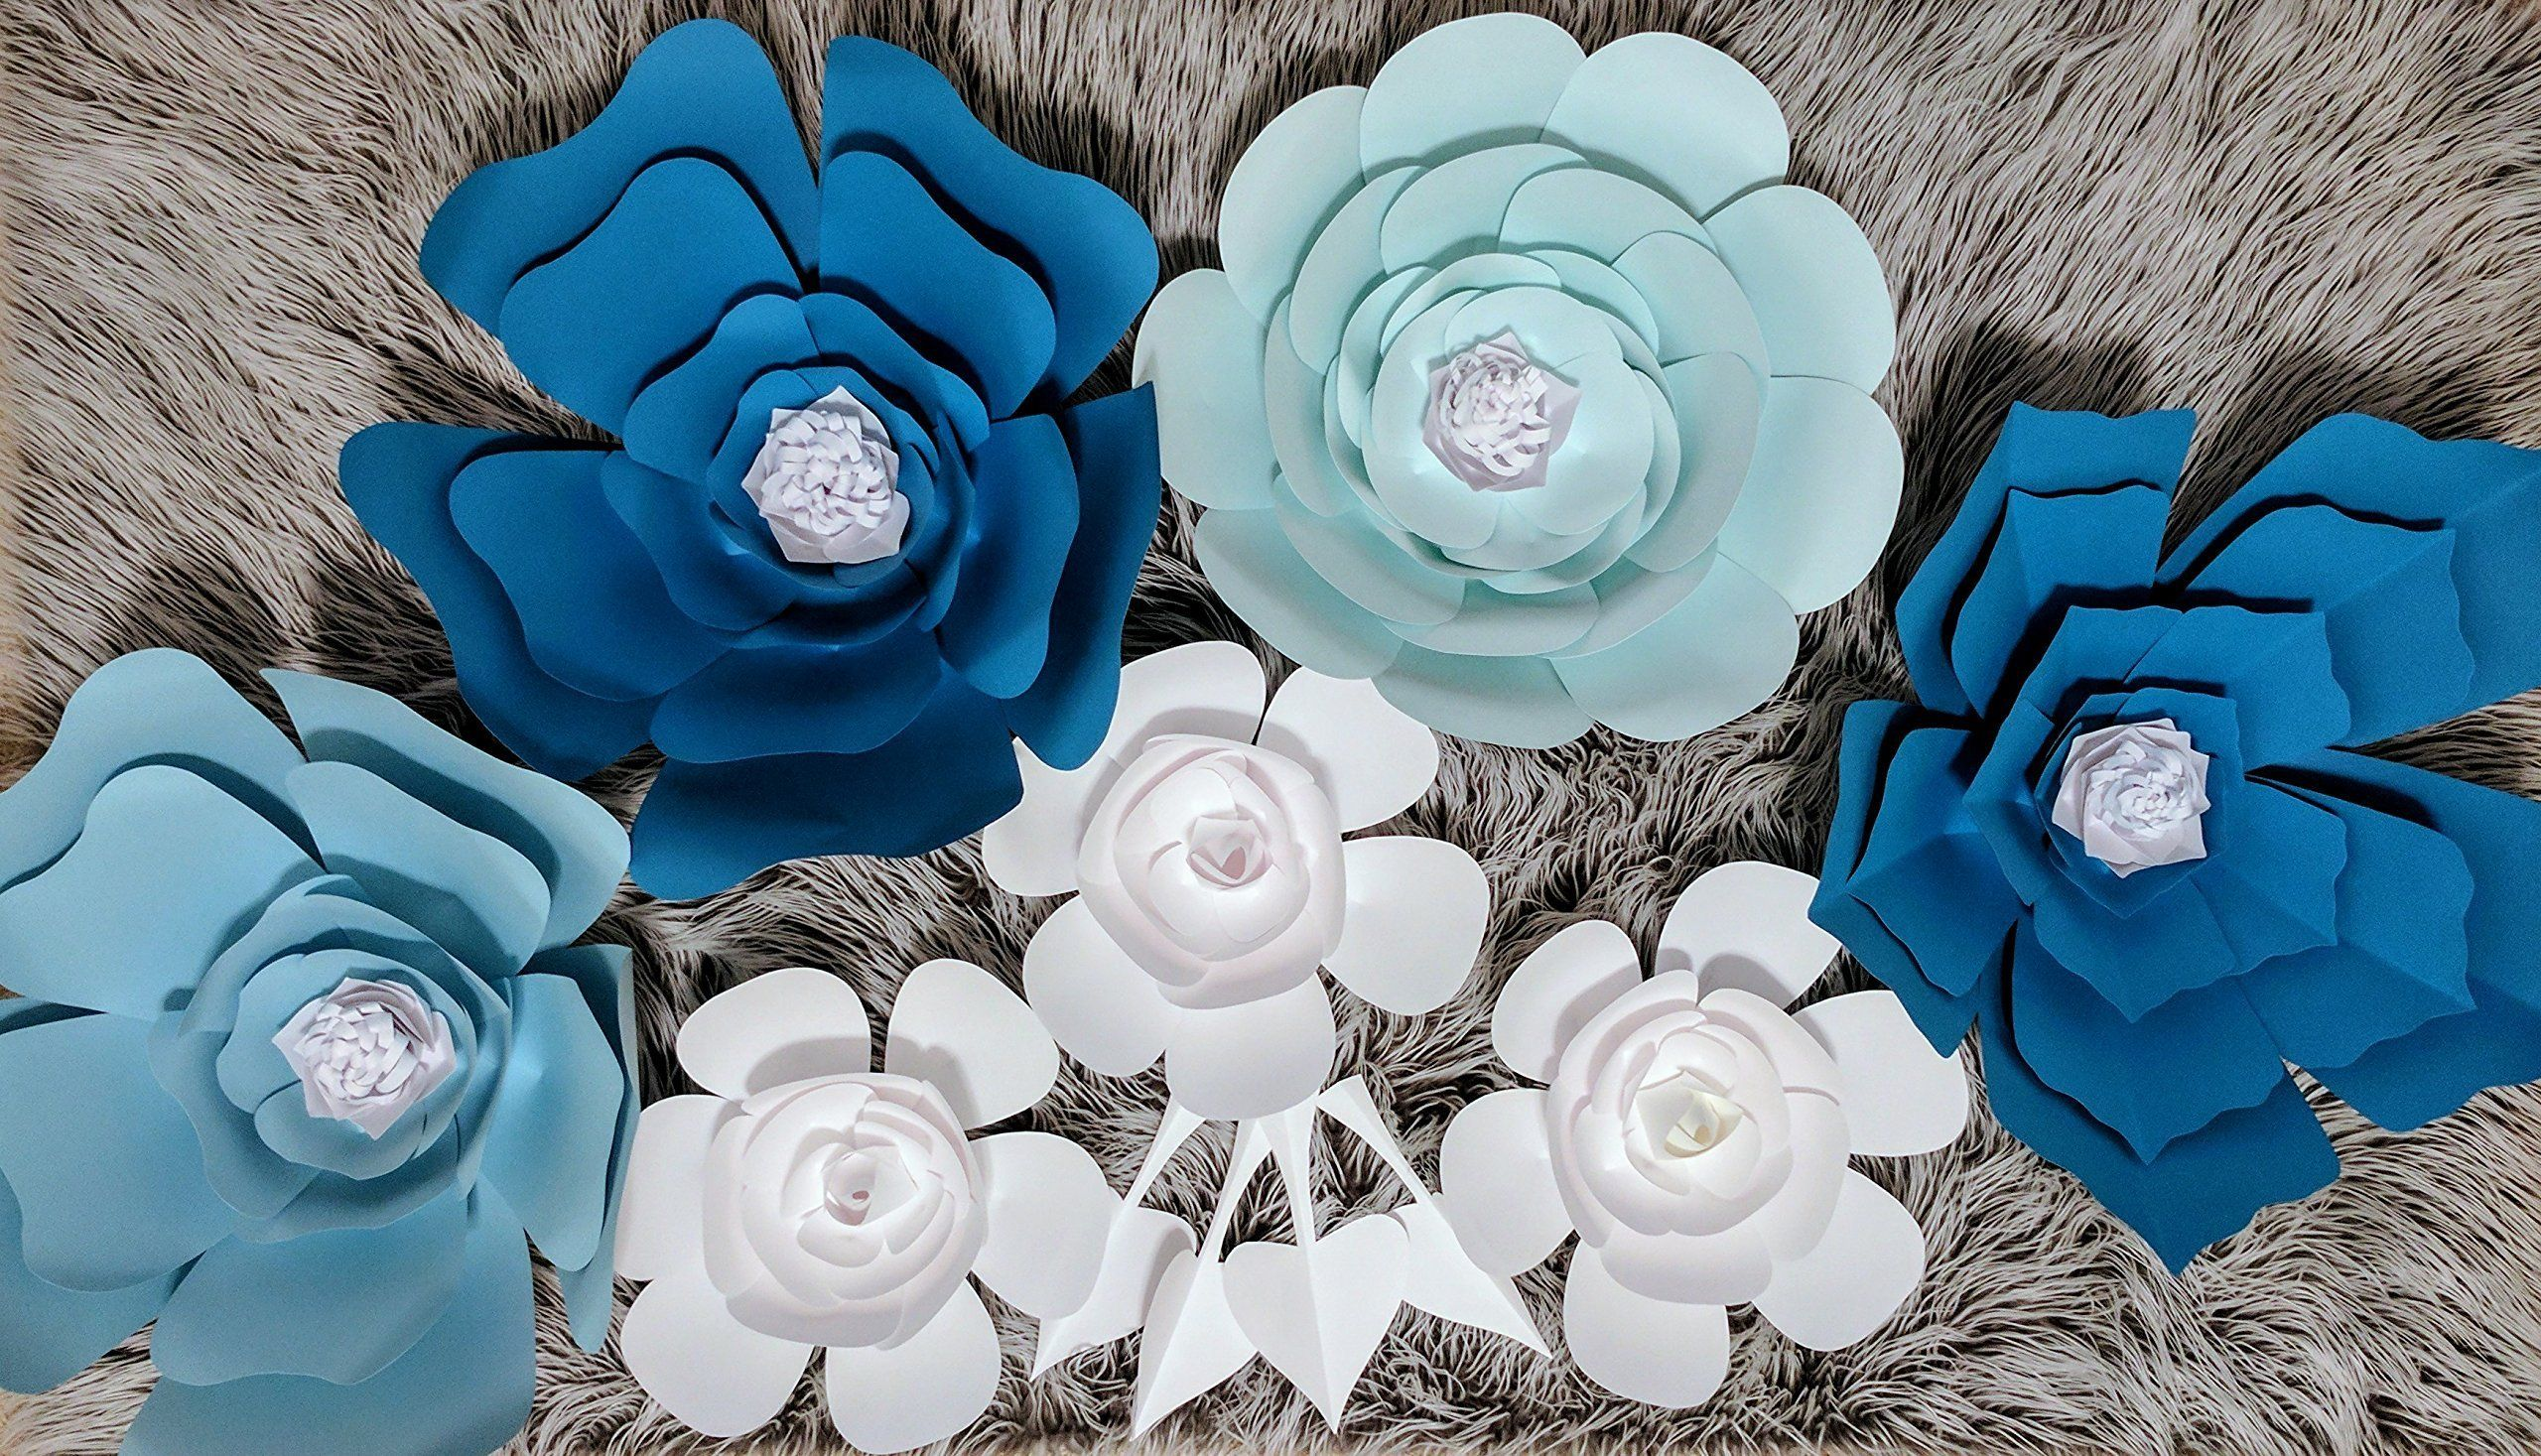 Paper Flowers Combo Set for Backdrops